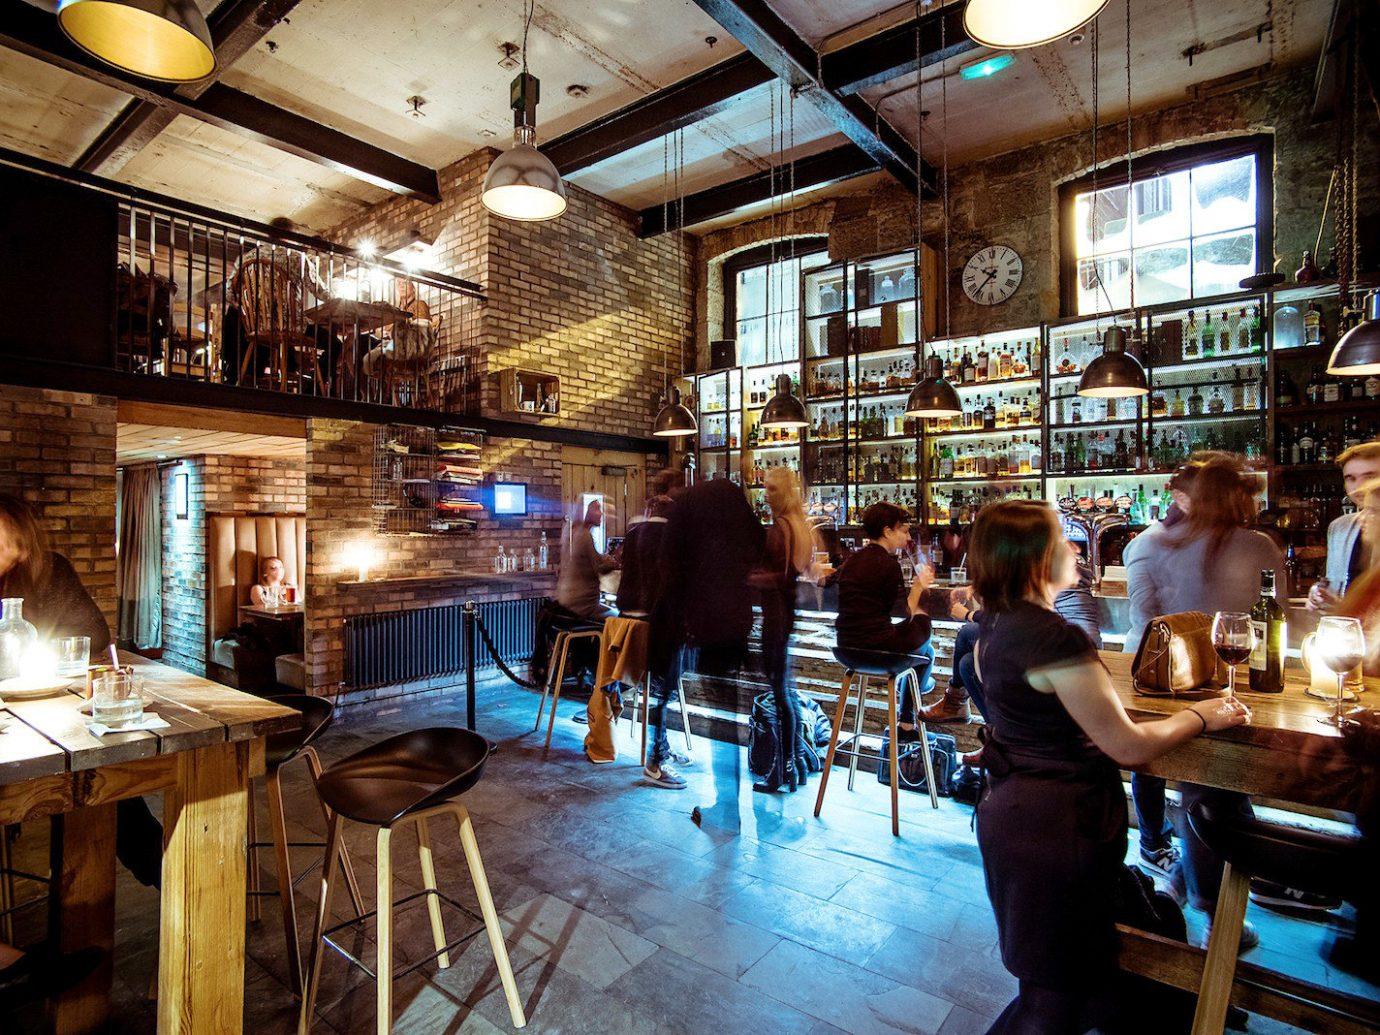 Edinburgh Hotels Jetsetter Guides Scotland Travel Tips Trip Ideas indoor floor person ceiling Bar restaurant tavern pub café interior design coffeehouse meal